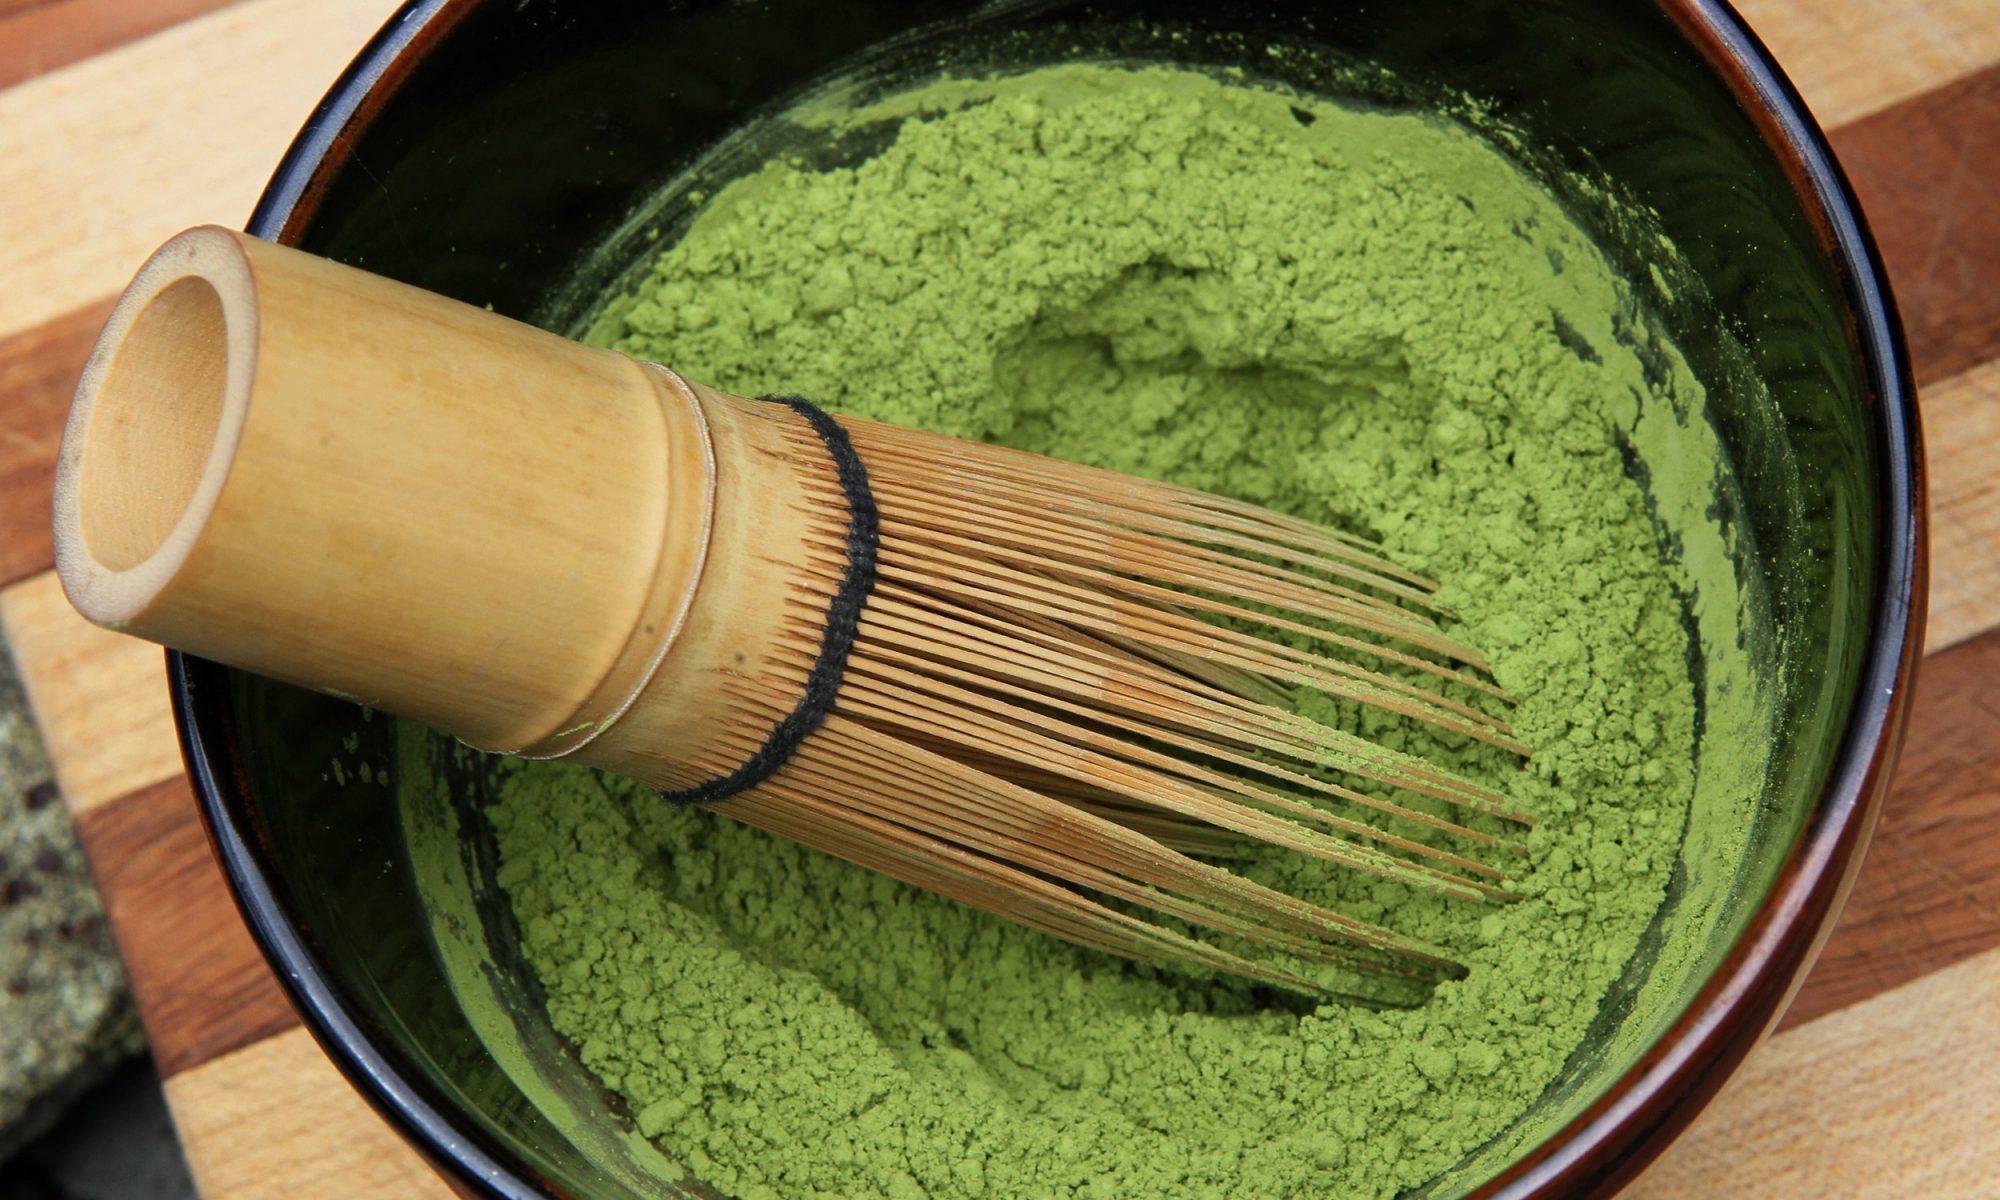 EC: Kyoto's Matcha Buffet Has Every Green Tea Treat You Can Imagine